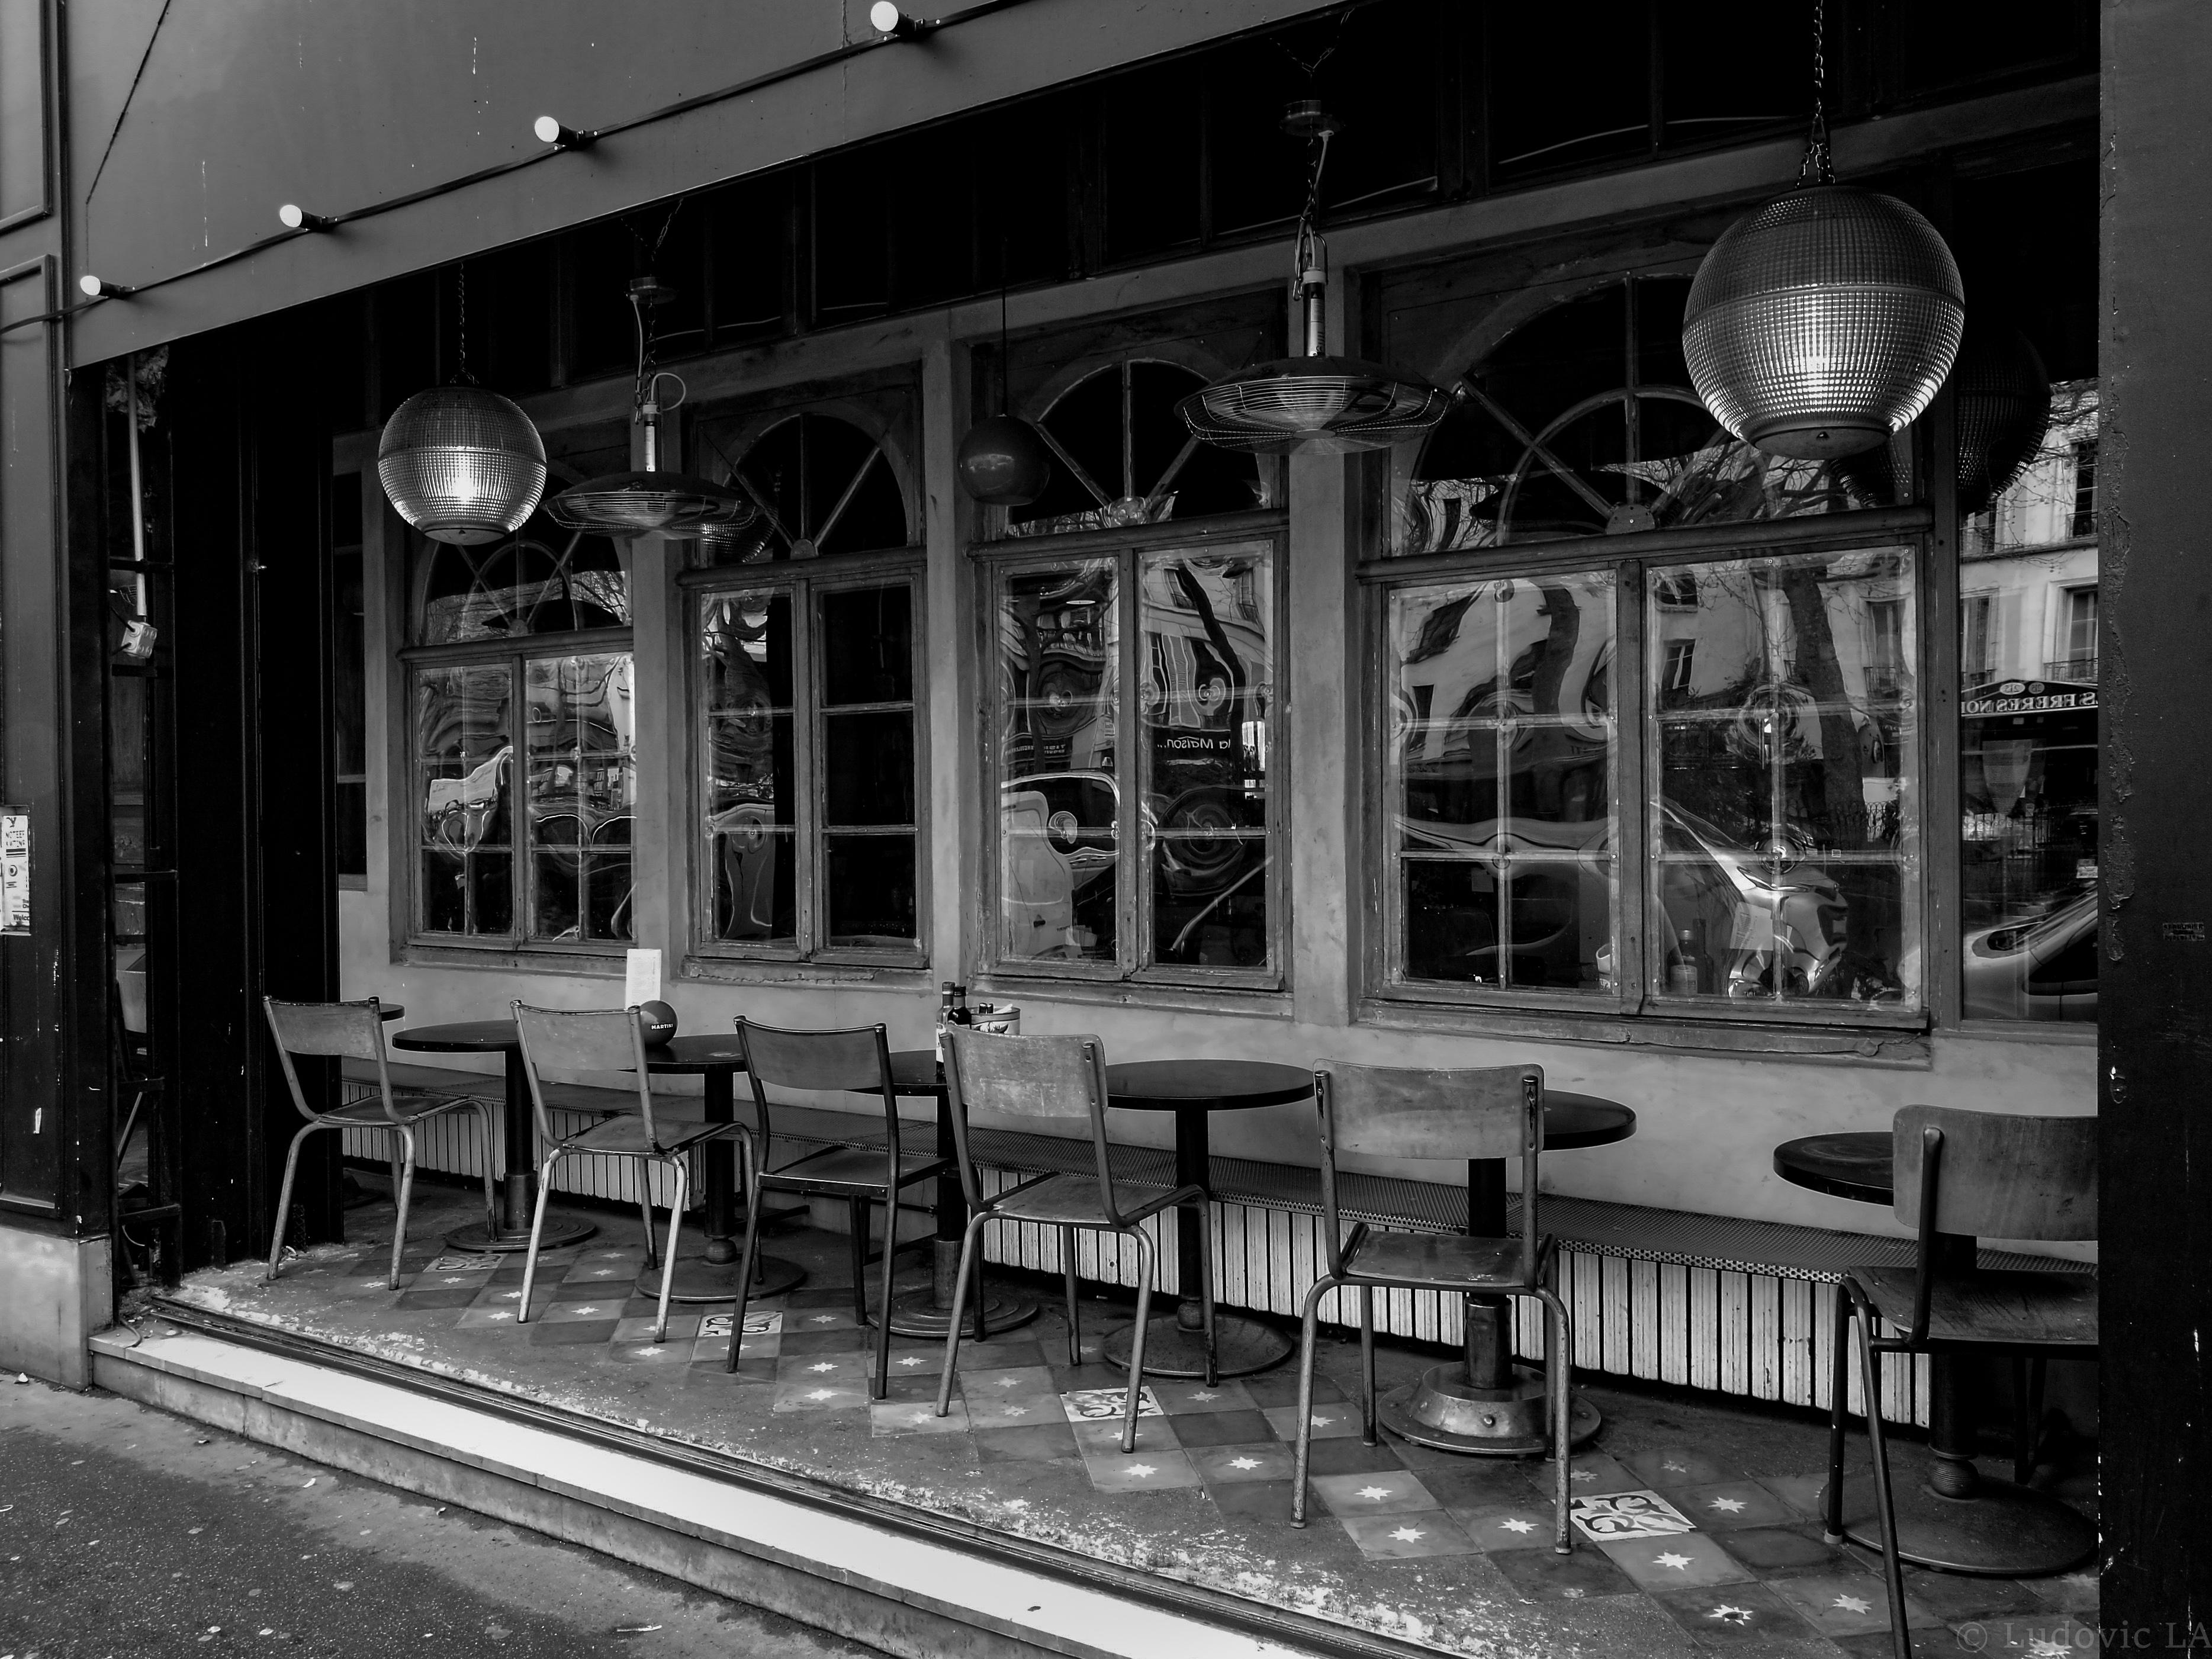 Wallpaper Window City Street Night Building Table Train Paris Metropolis Streetart Cafe Rue Noiretblanc Monochrom Facade Lumiere Exterieur Black And White Monochrome Photography Metropolitan Area Public Transport Chaise